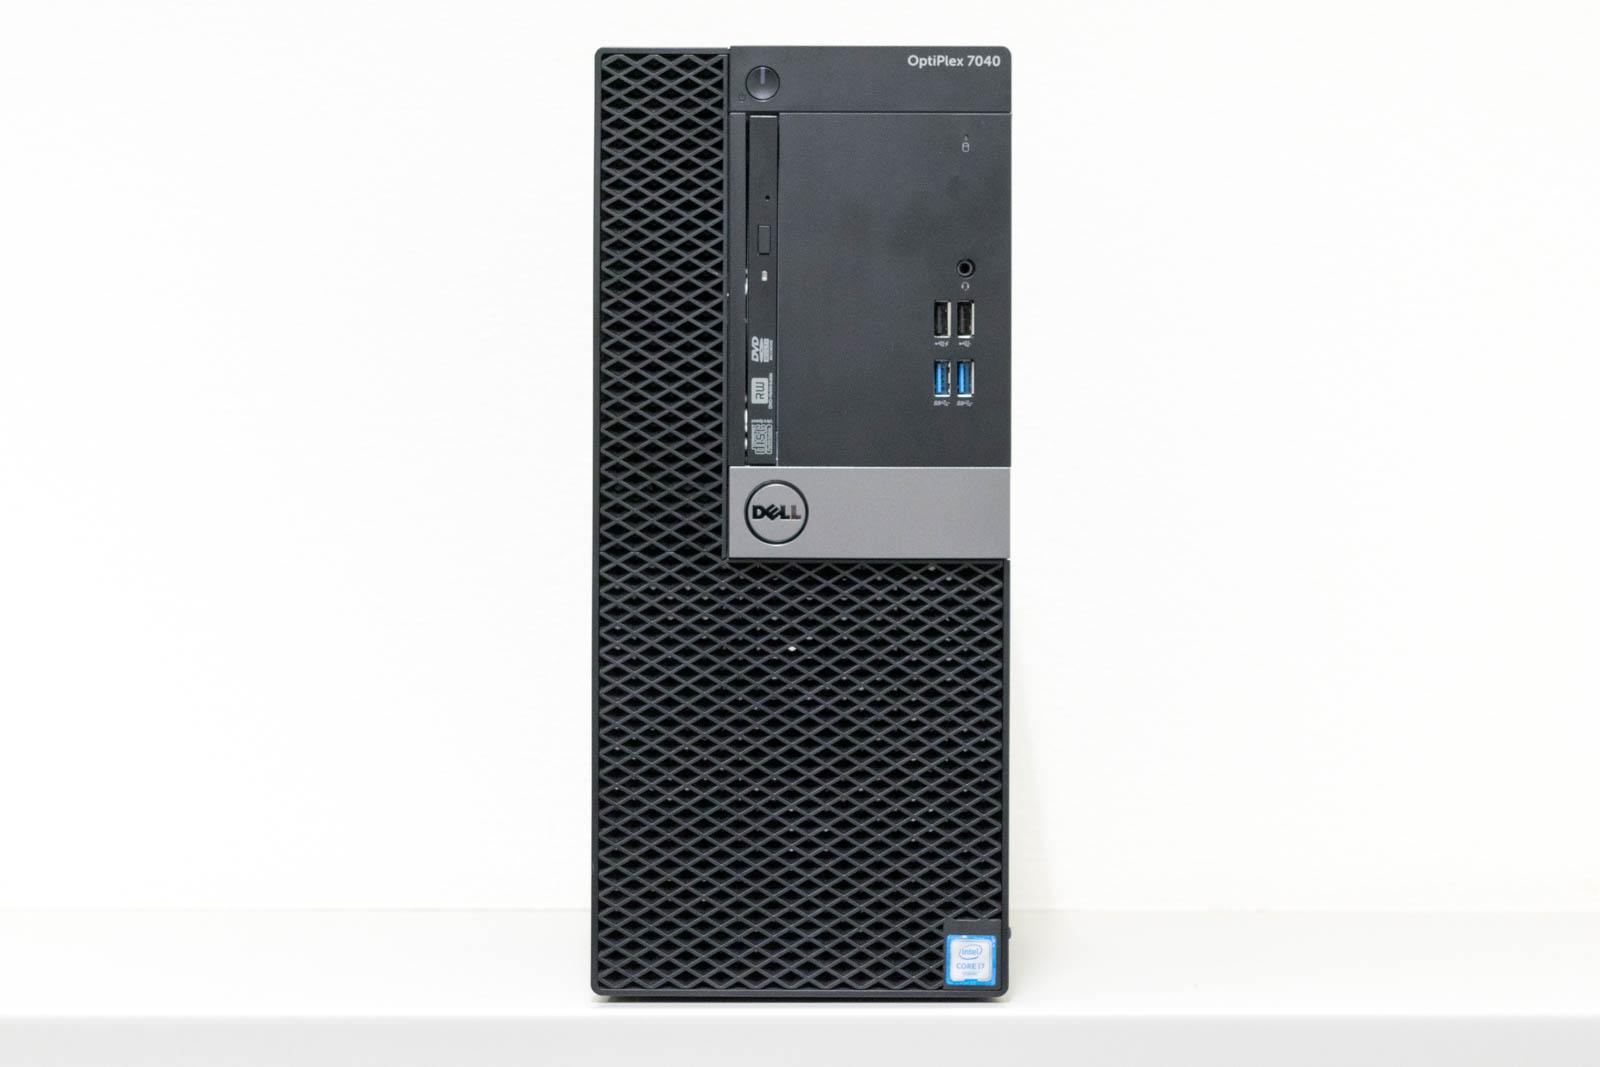 DELL OptiPlex 7040 ミニタワー, Windows 10 Pro 64bit, Core i7-6700, メモリ16GB(8GBx2), 1TB HDD, GeForce GTX745 4GB 【中古】